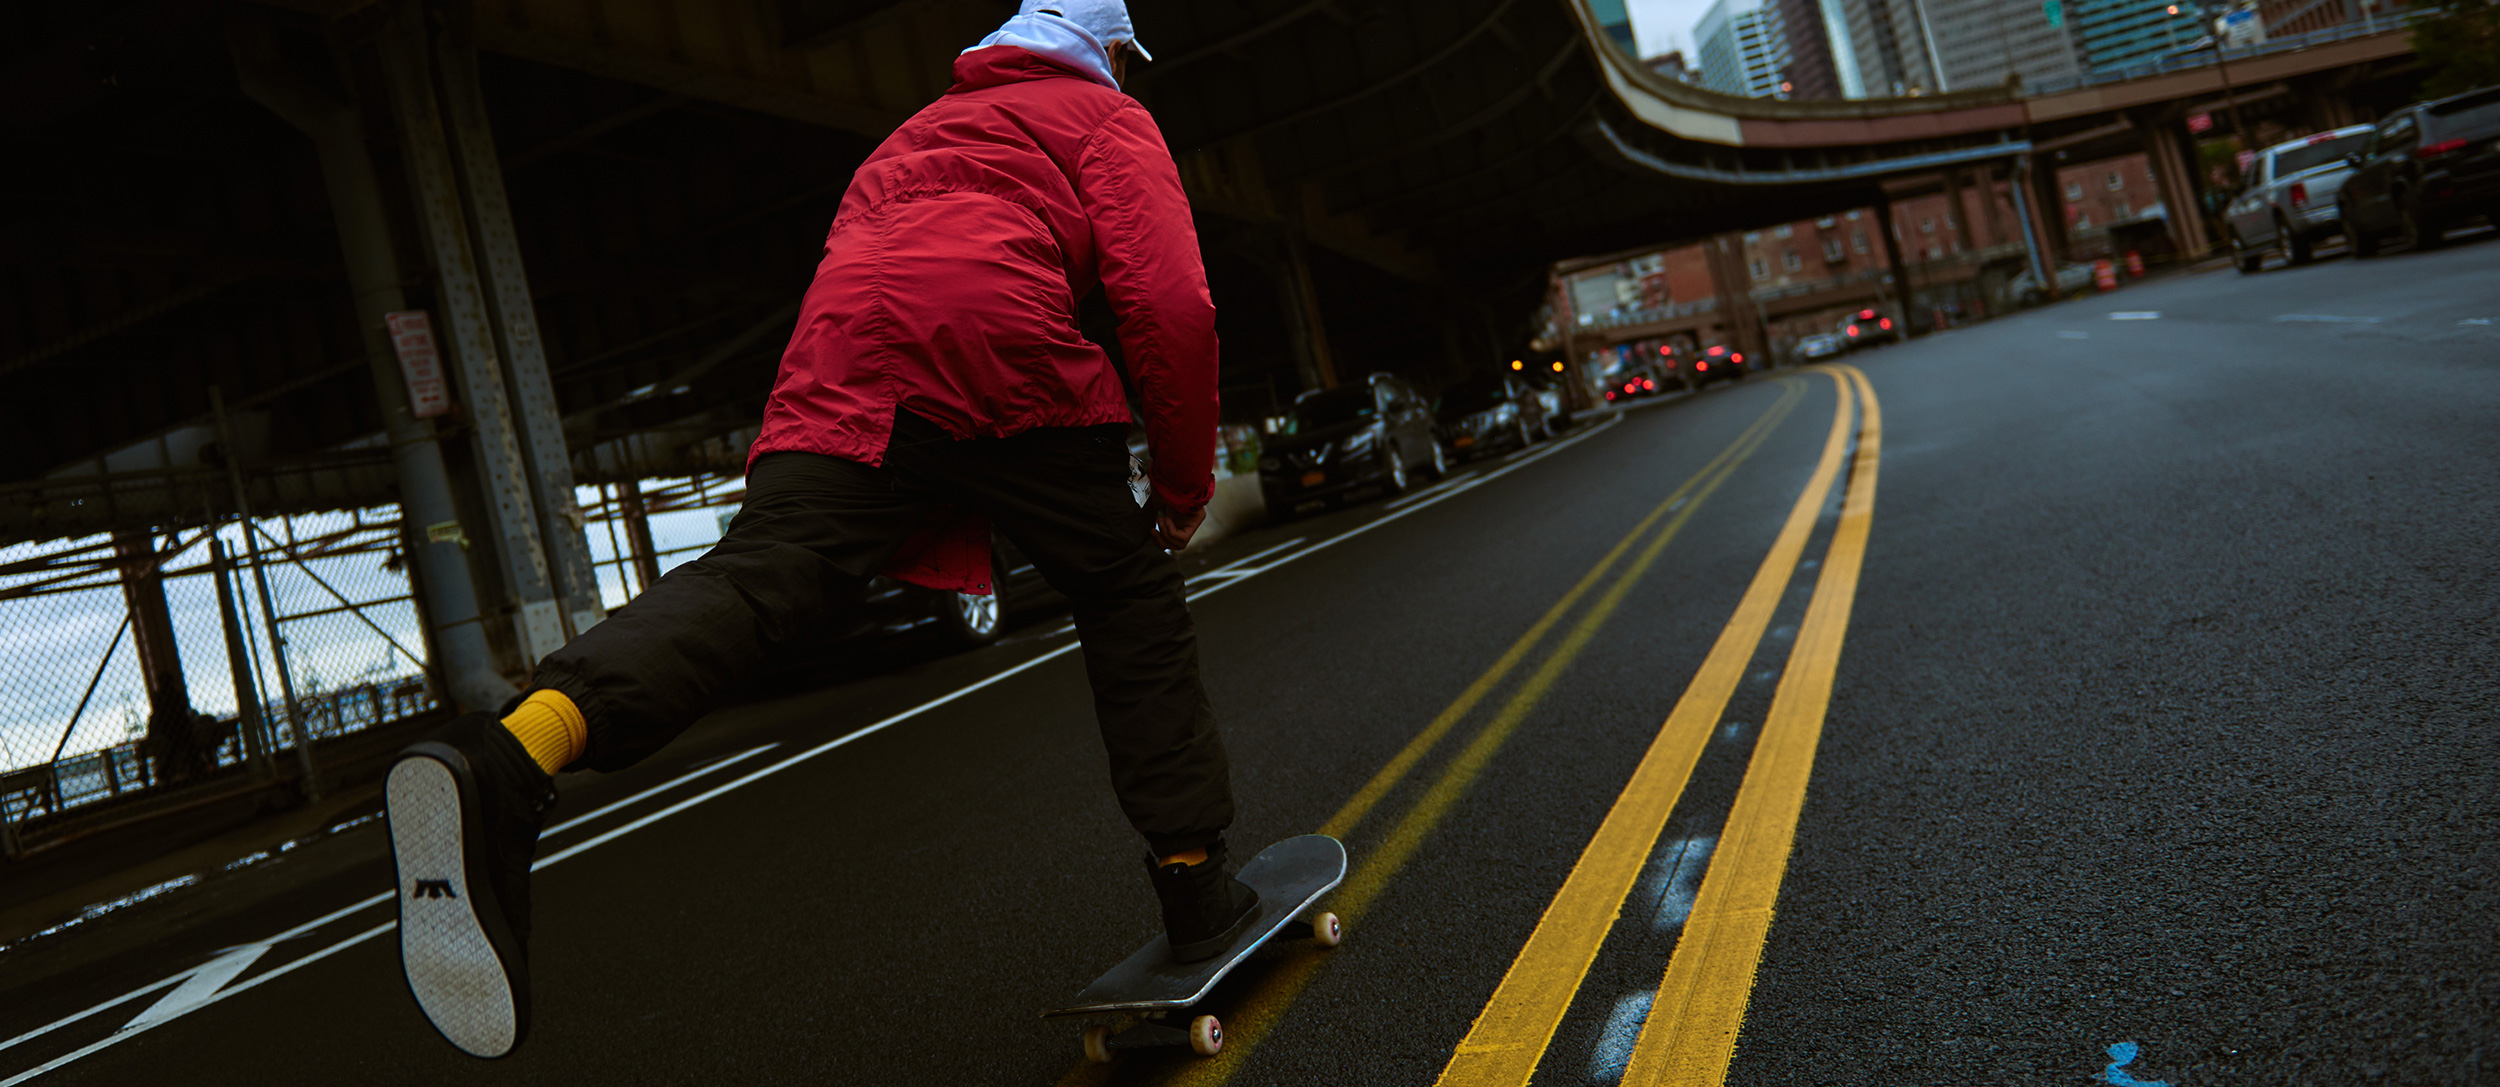 skate-yellow-primary-alt_lg.jpg